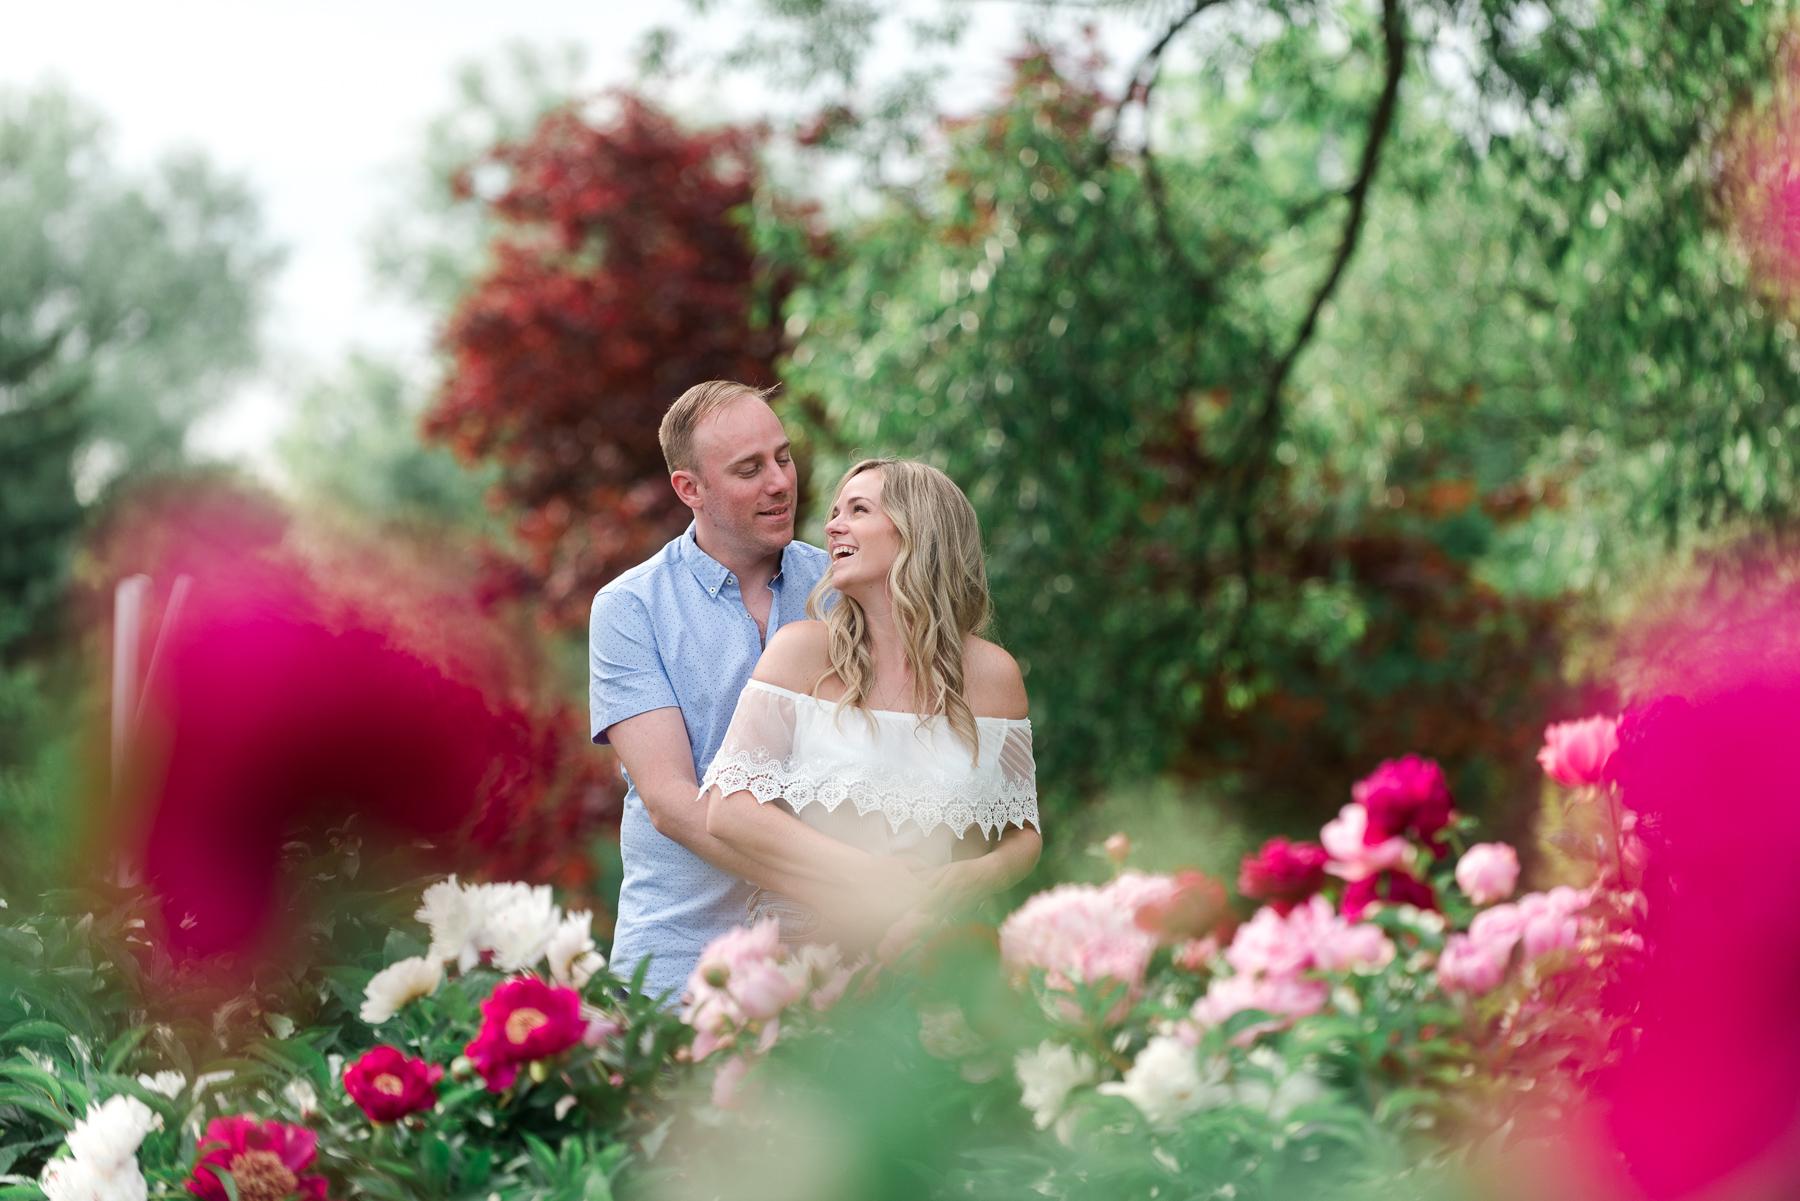 engaged couple at Peony Festival in Oshawa Valley Botanical Gardens